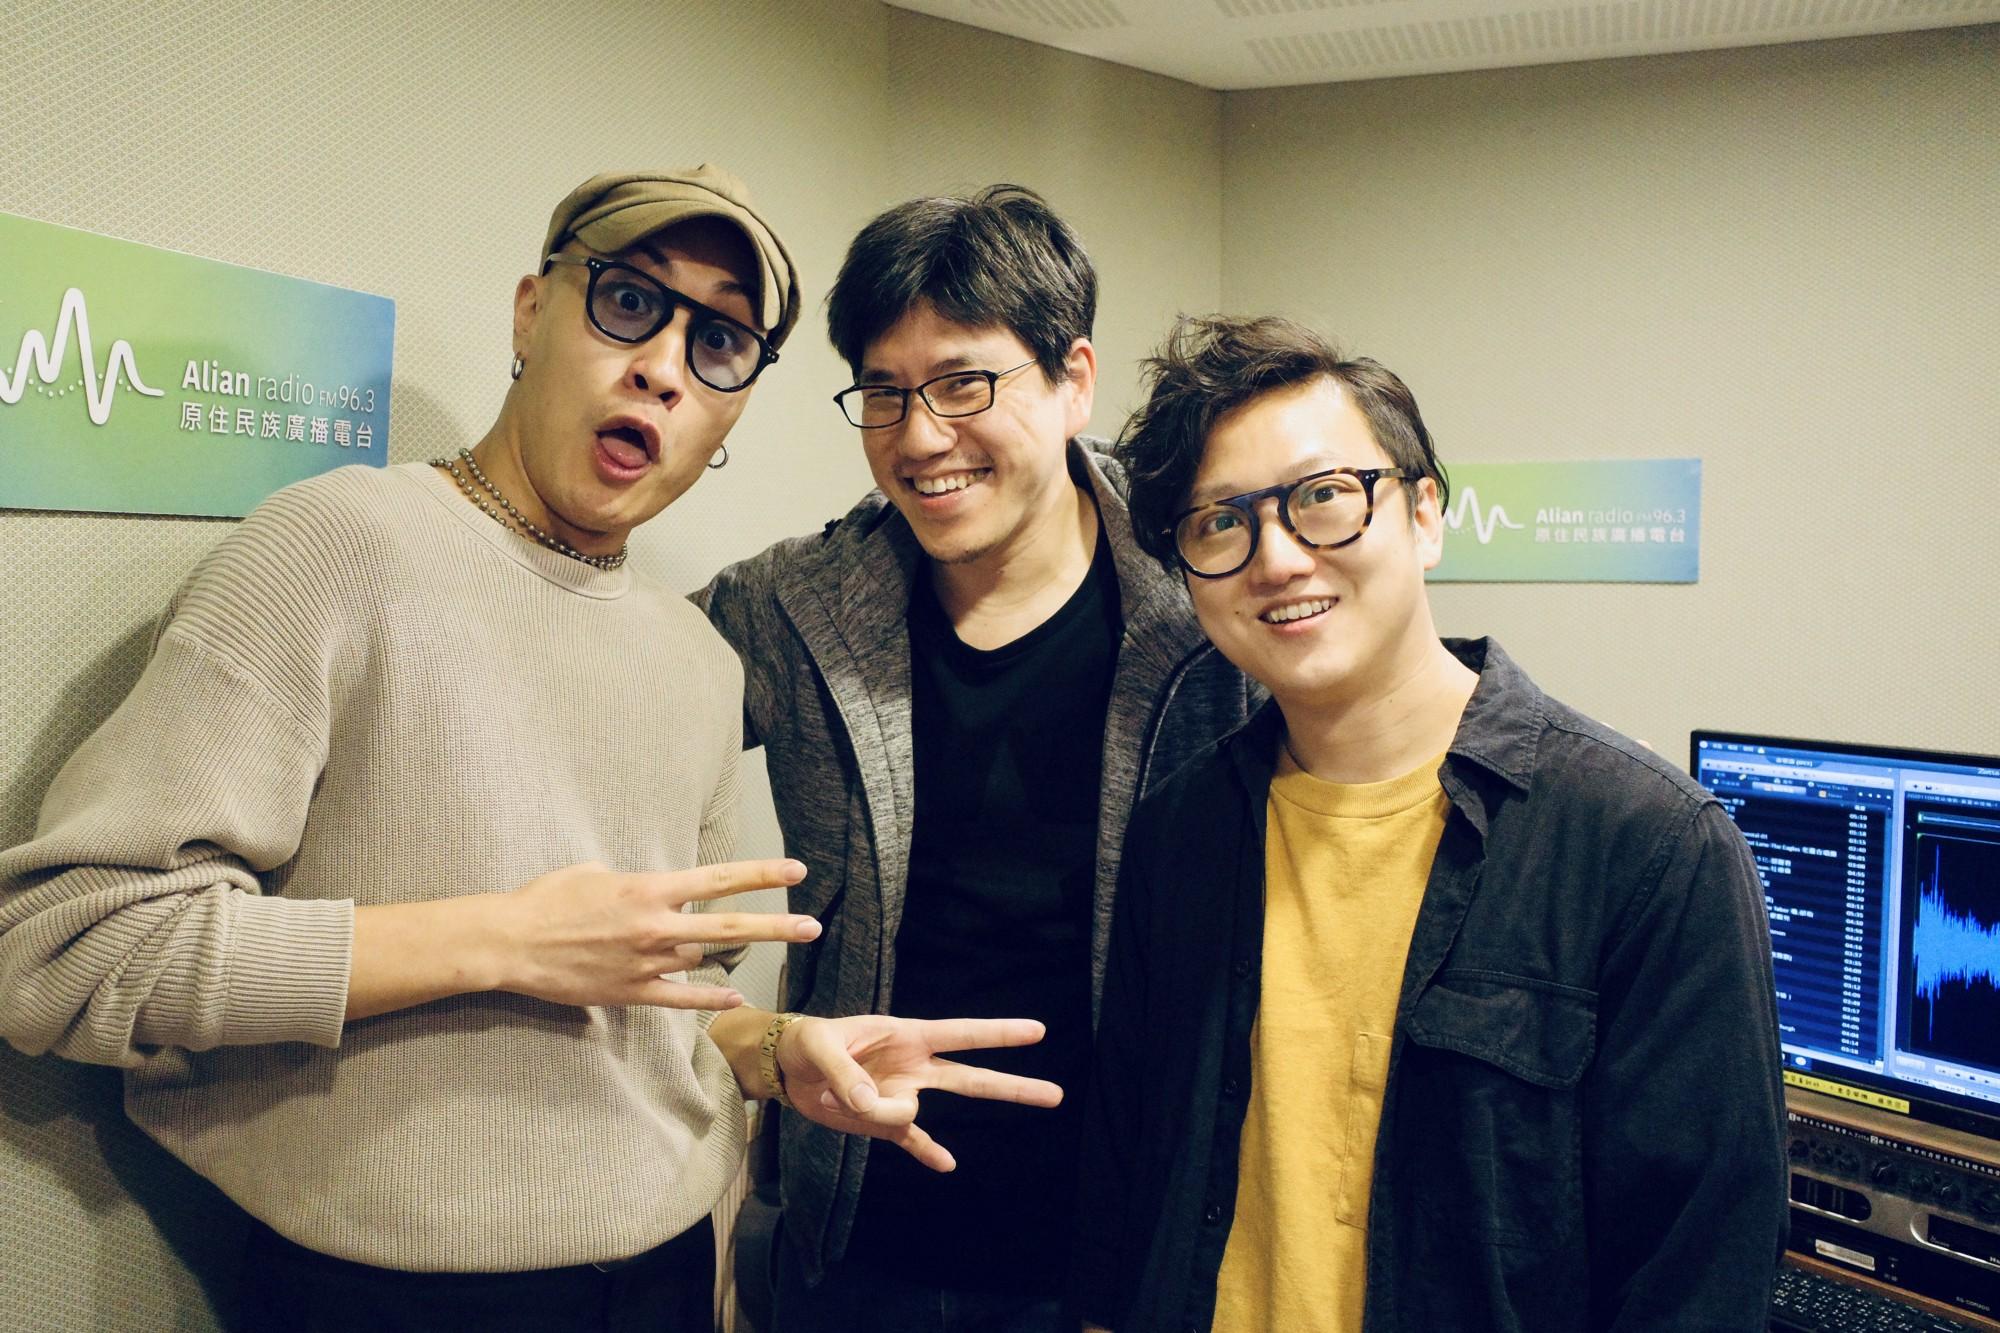 YELLOW黃宣談《浮世擊》 + mini live空中現場 feat. 共同製作人余佳倫